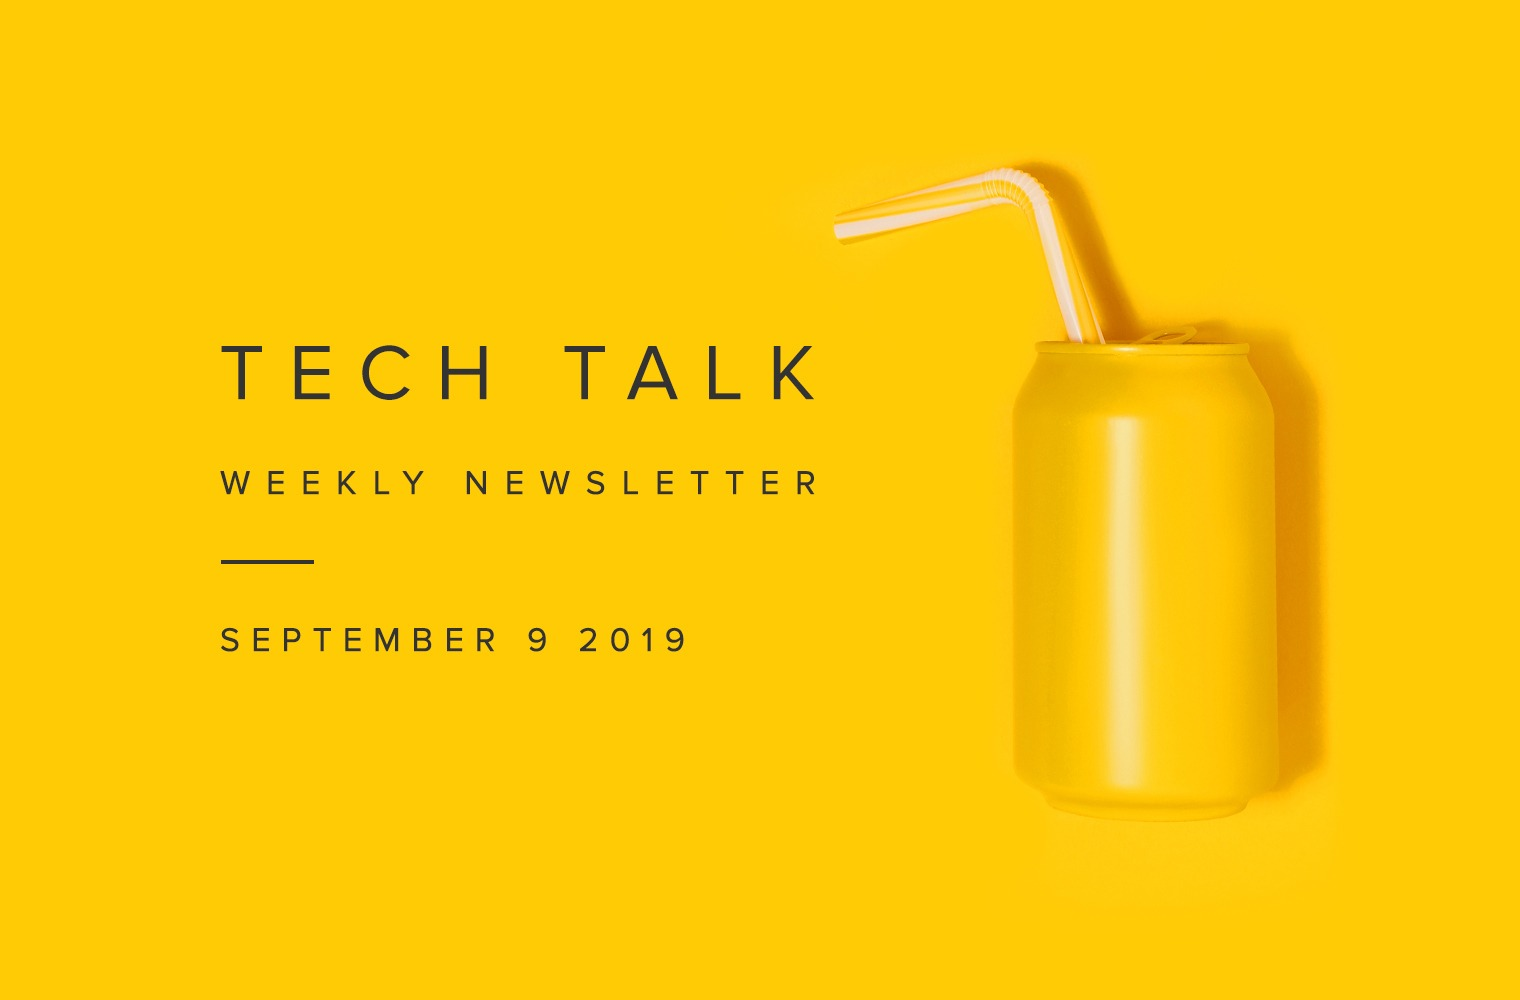 EMPIST Tech Talk Weekly Newsletter: Monday, September 9, 2019